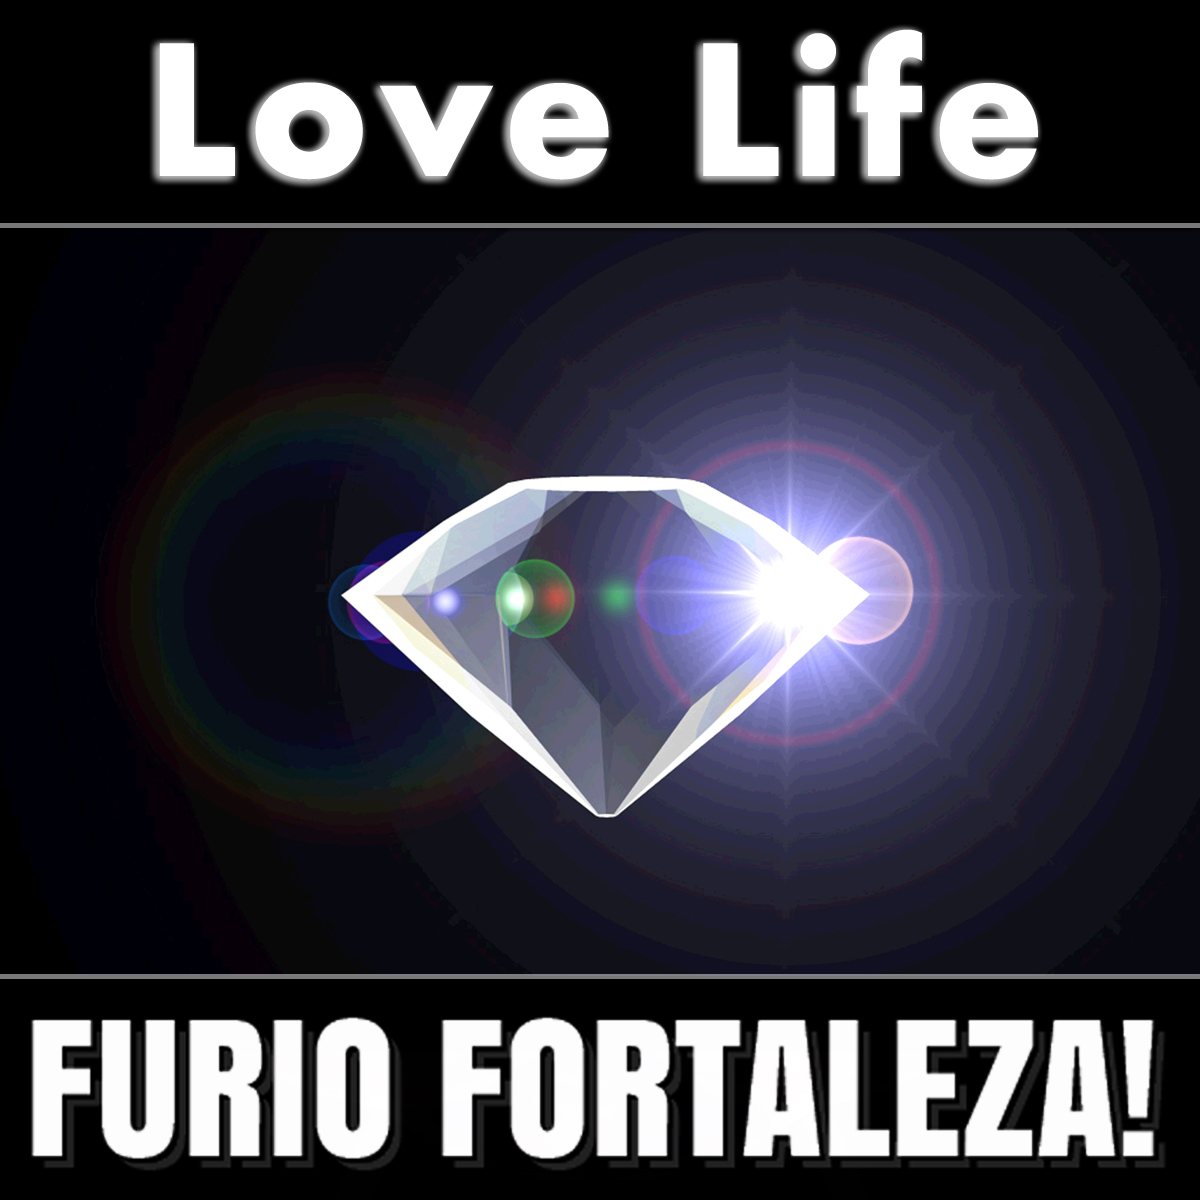 Furio Fortaleza! - 3.8 - Love Life